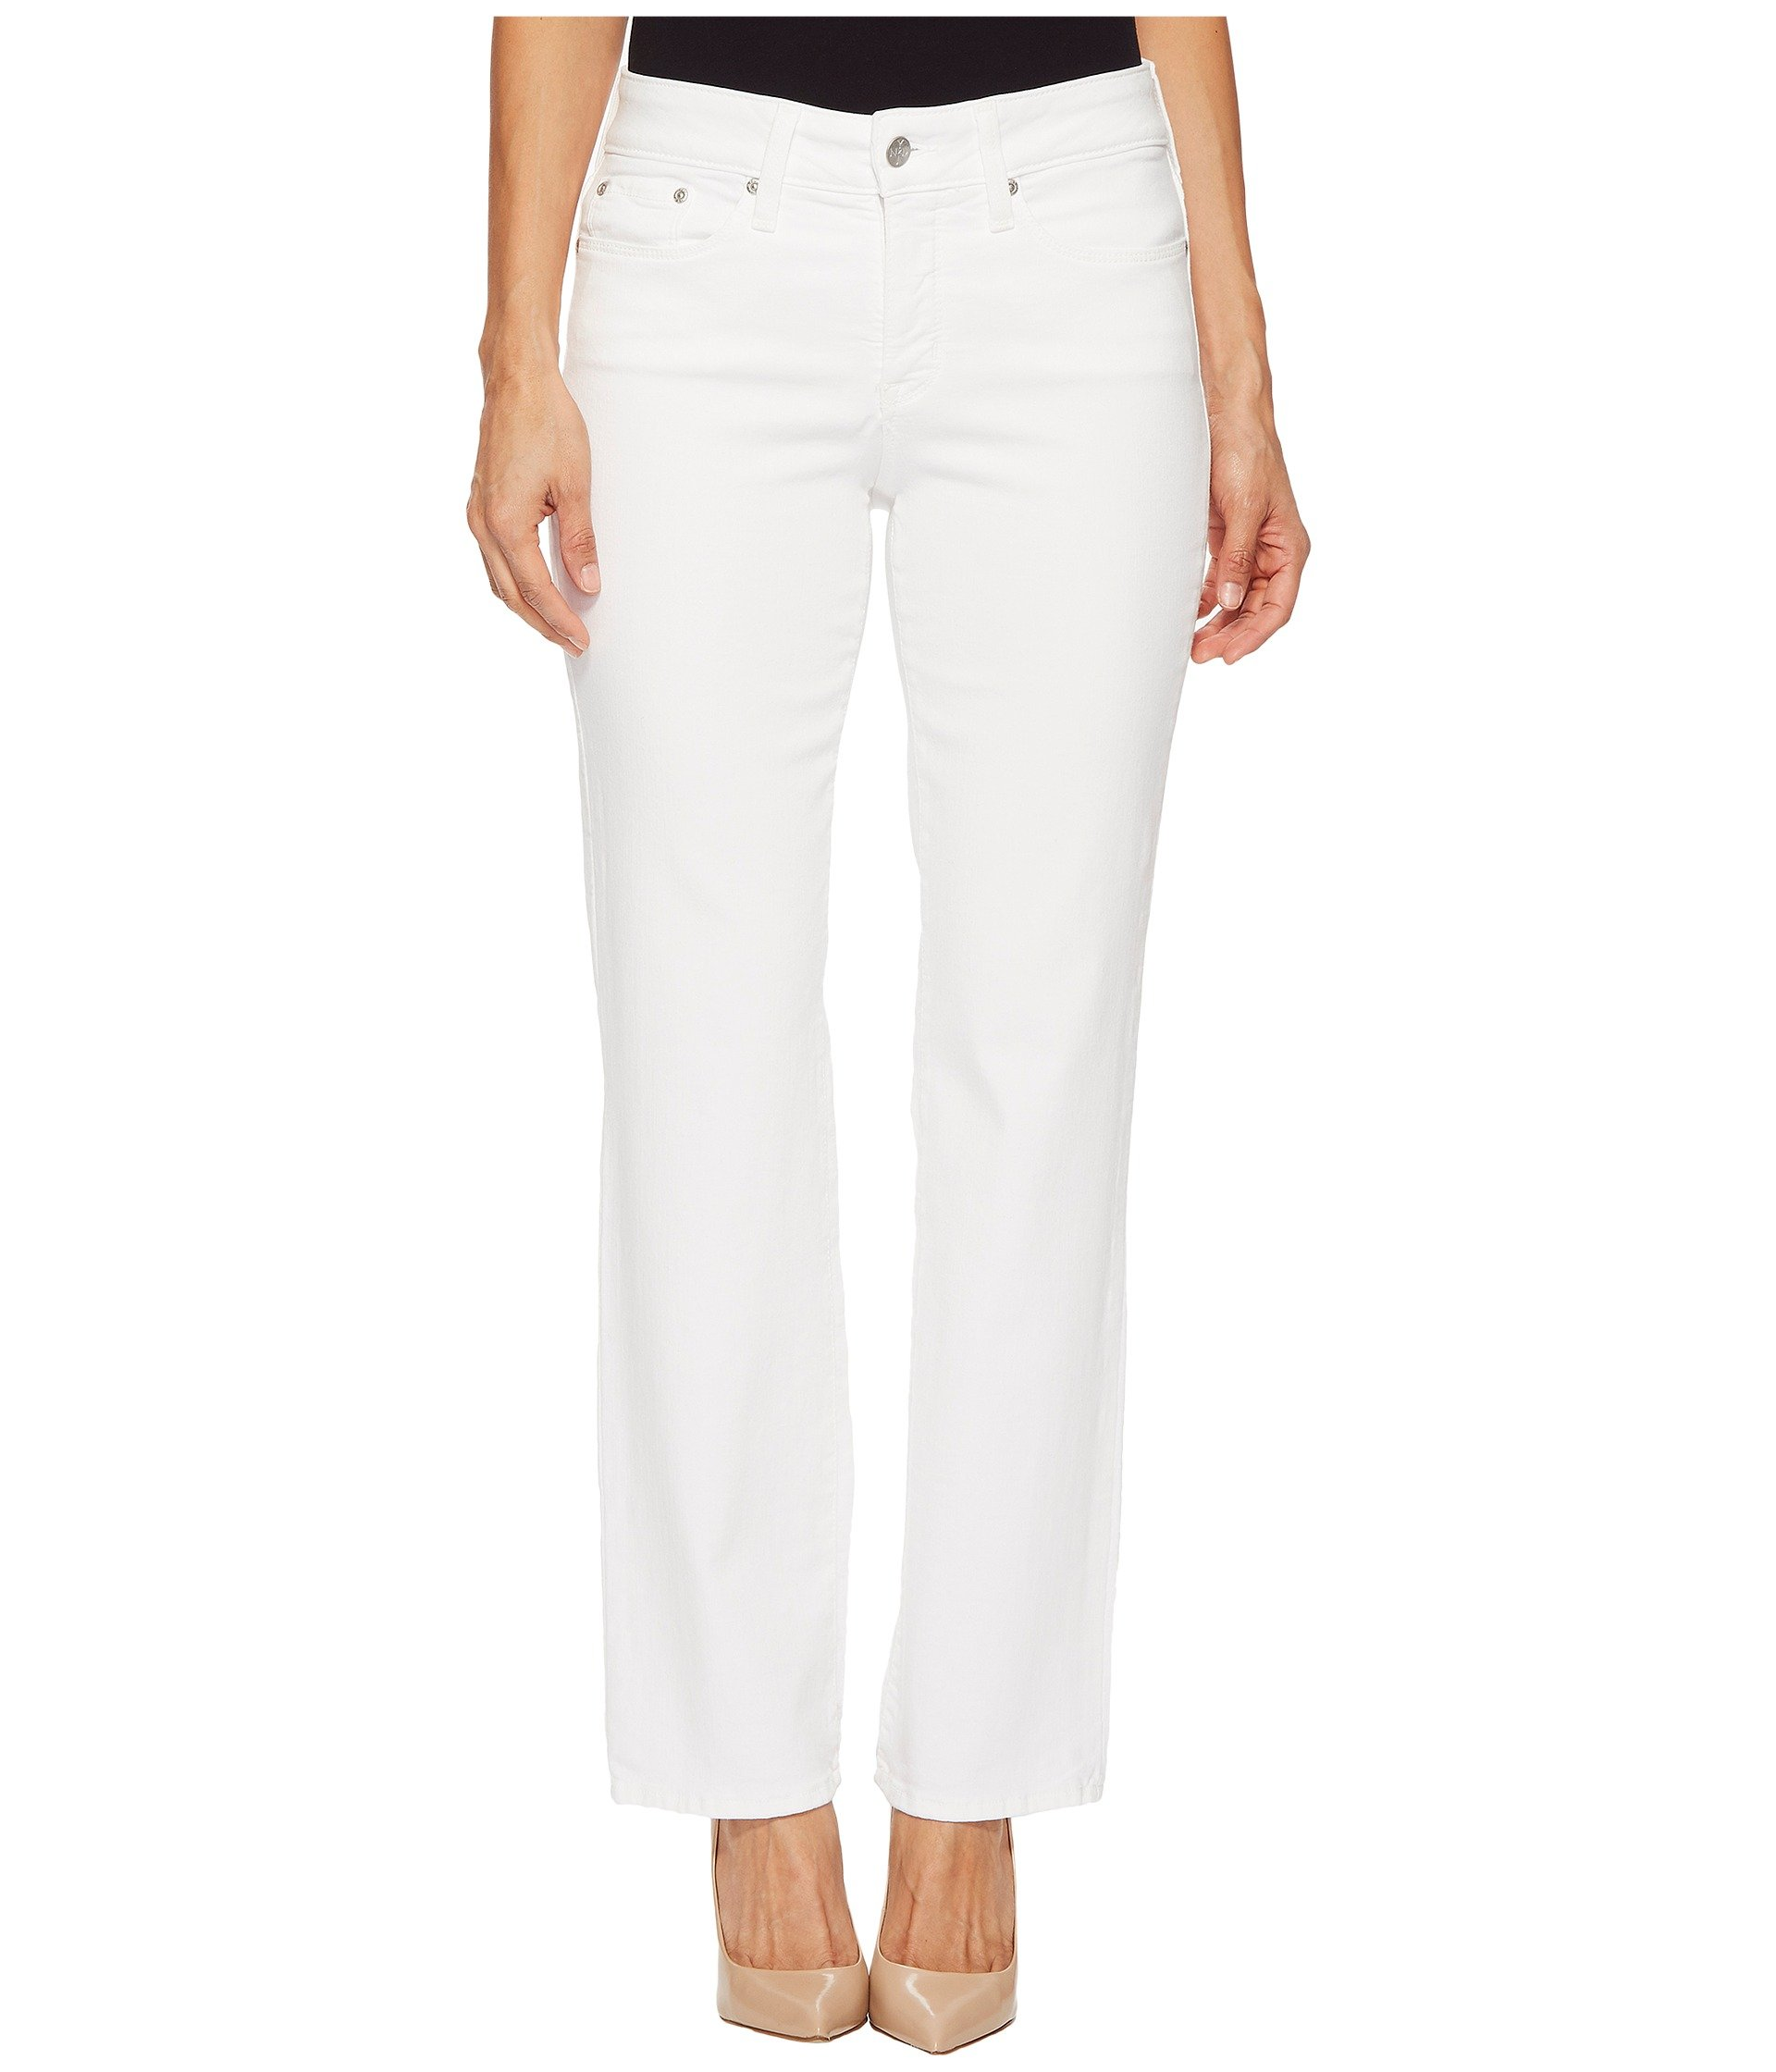 NYDJ Women's Petite Marilyn Straight Leg Jean, Optic White, 0P